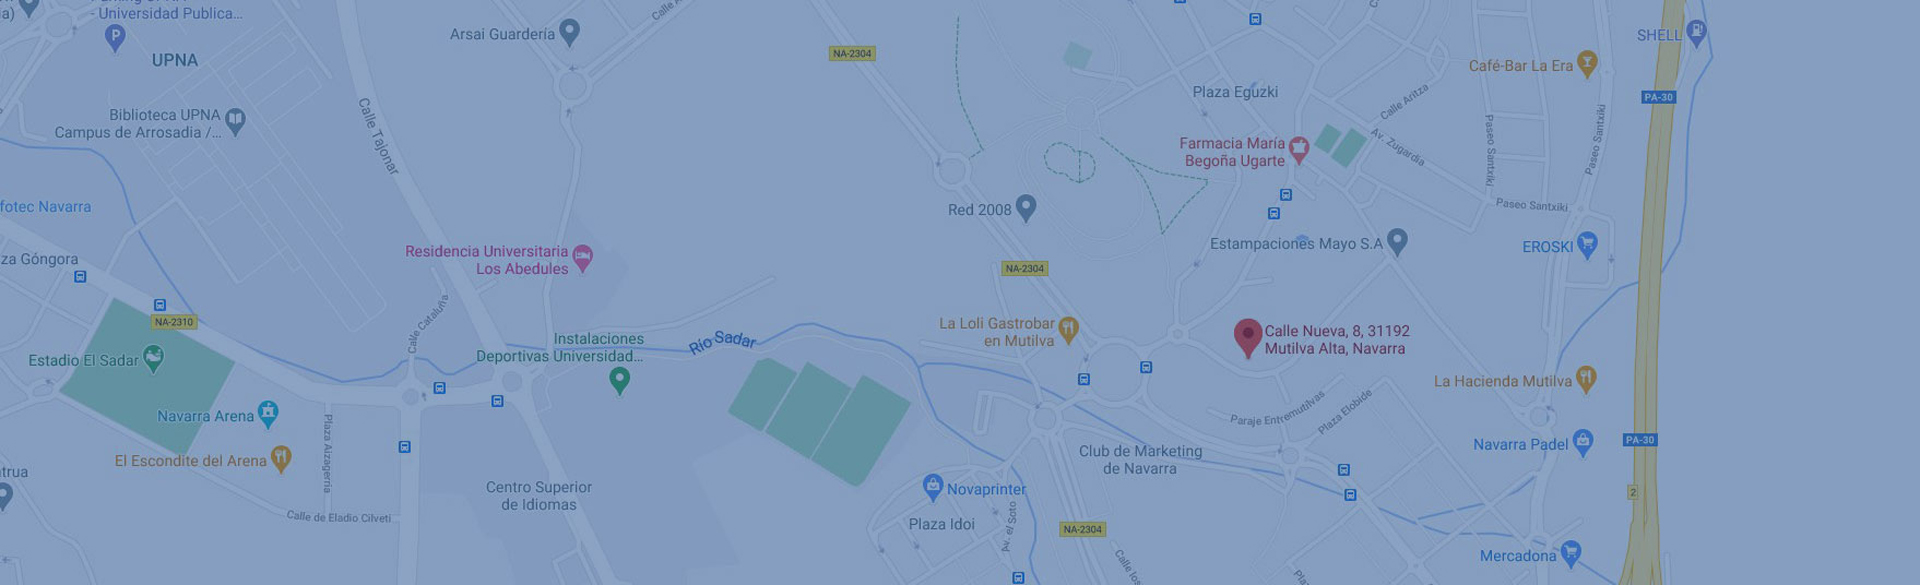 ISFSC Renting, Haz clic para abrir mapa en MAPS